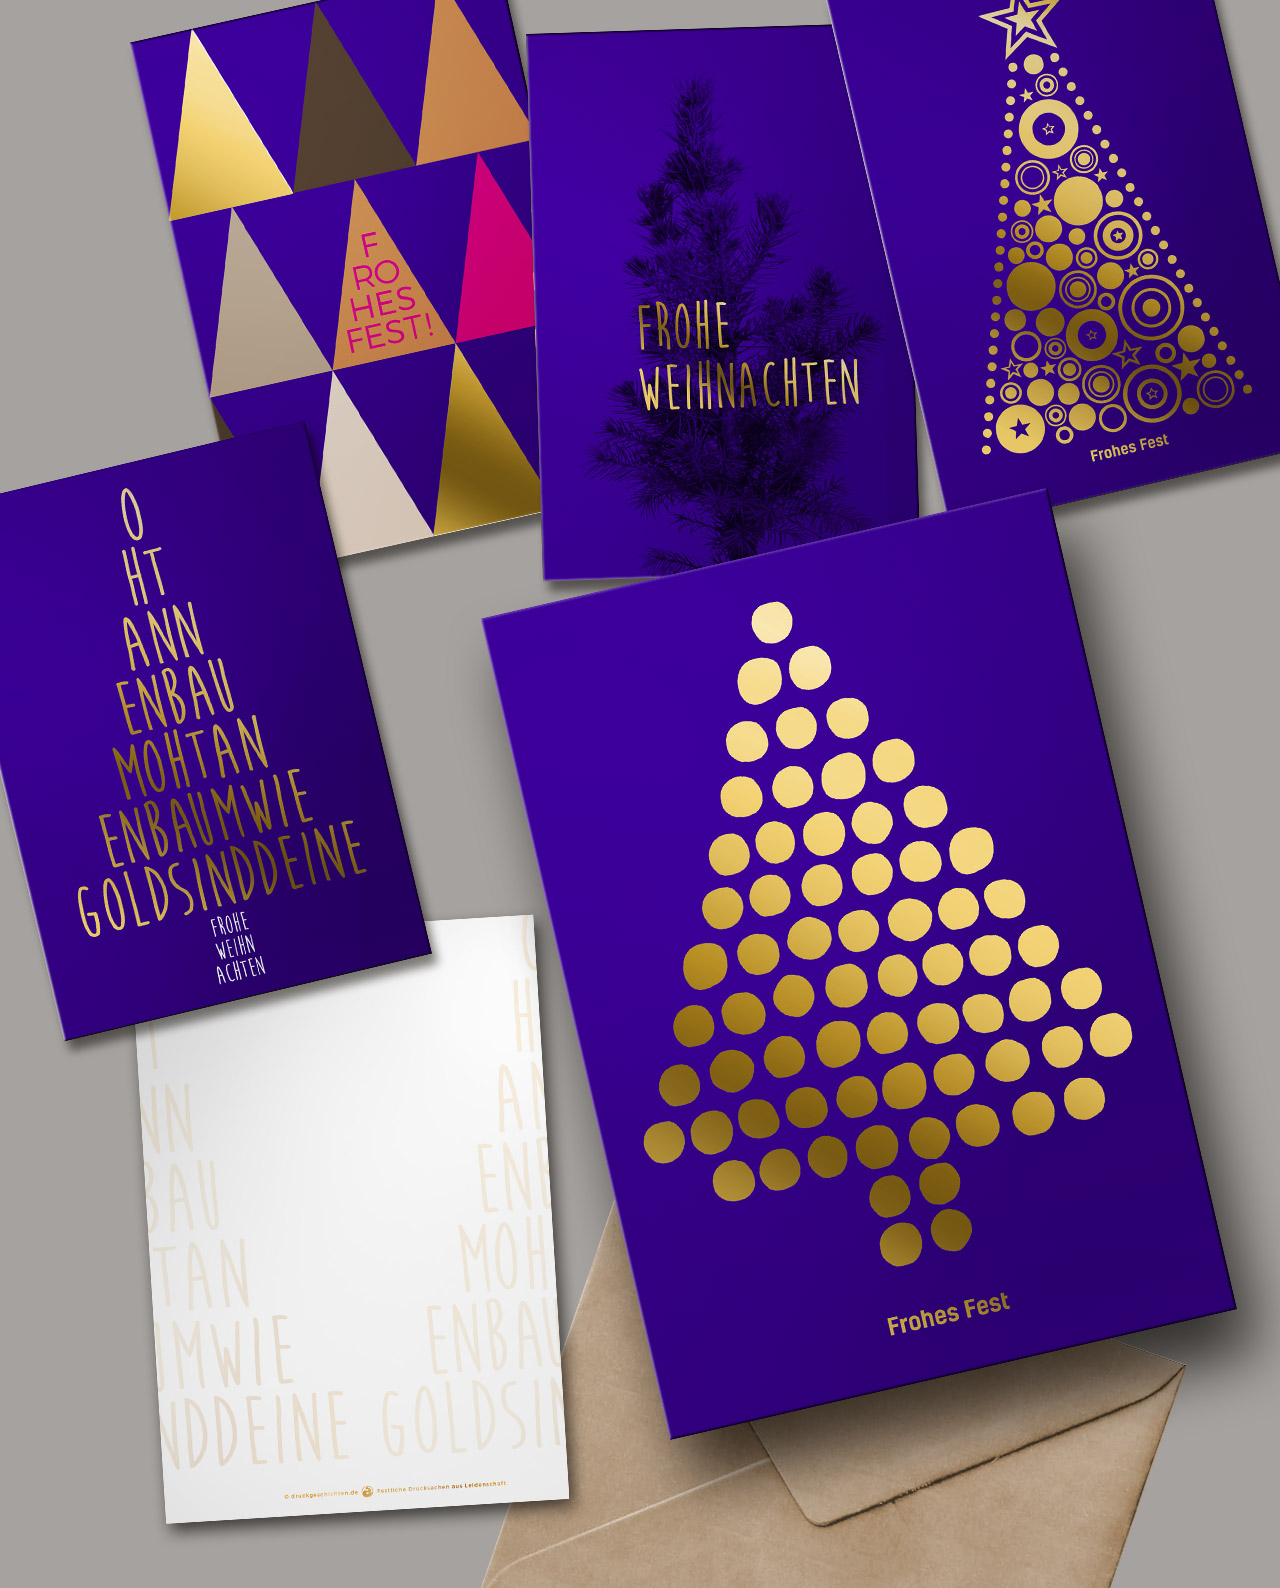 5er weihnachtskarten set gl nzend veredelt mit goldfolie. Black Bedroom Furniture Sets. Home Design Ideas